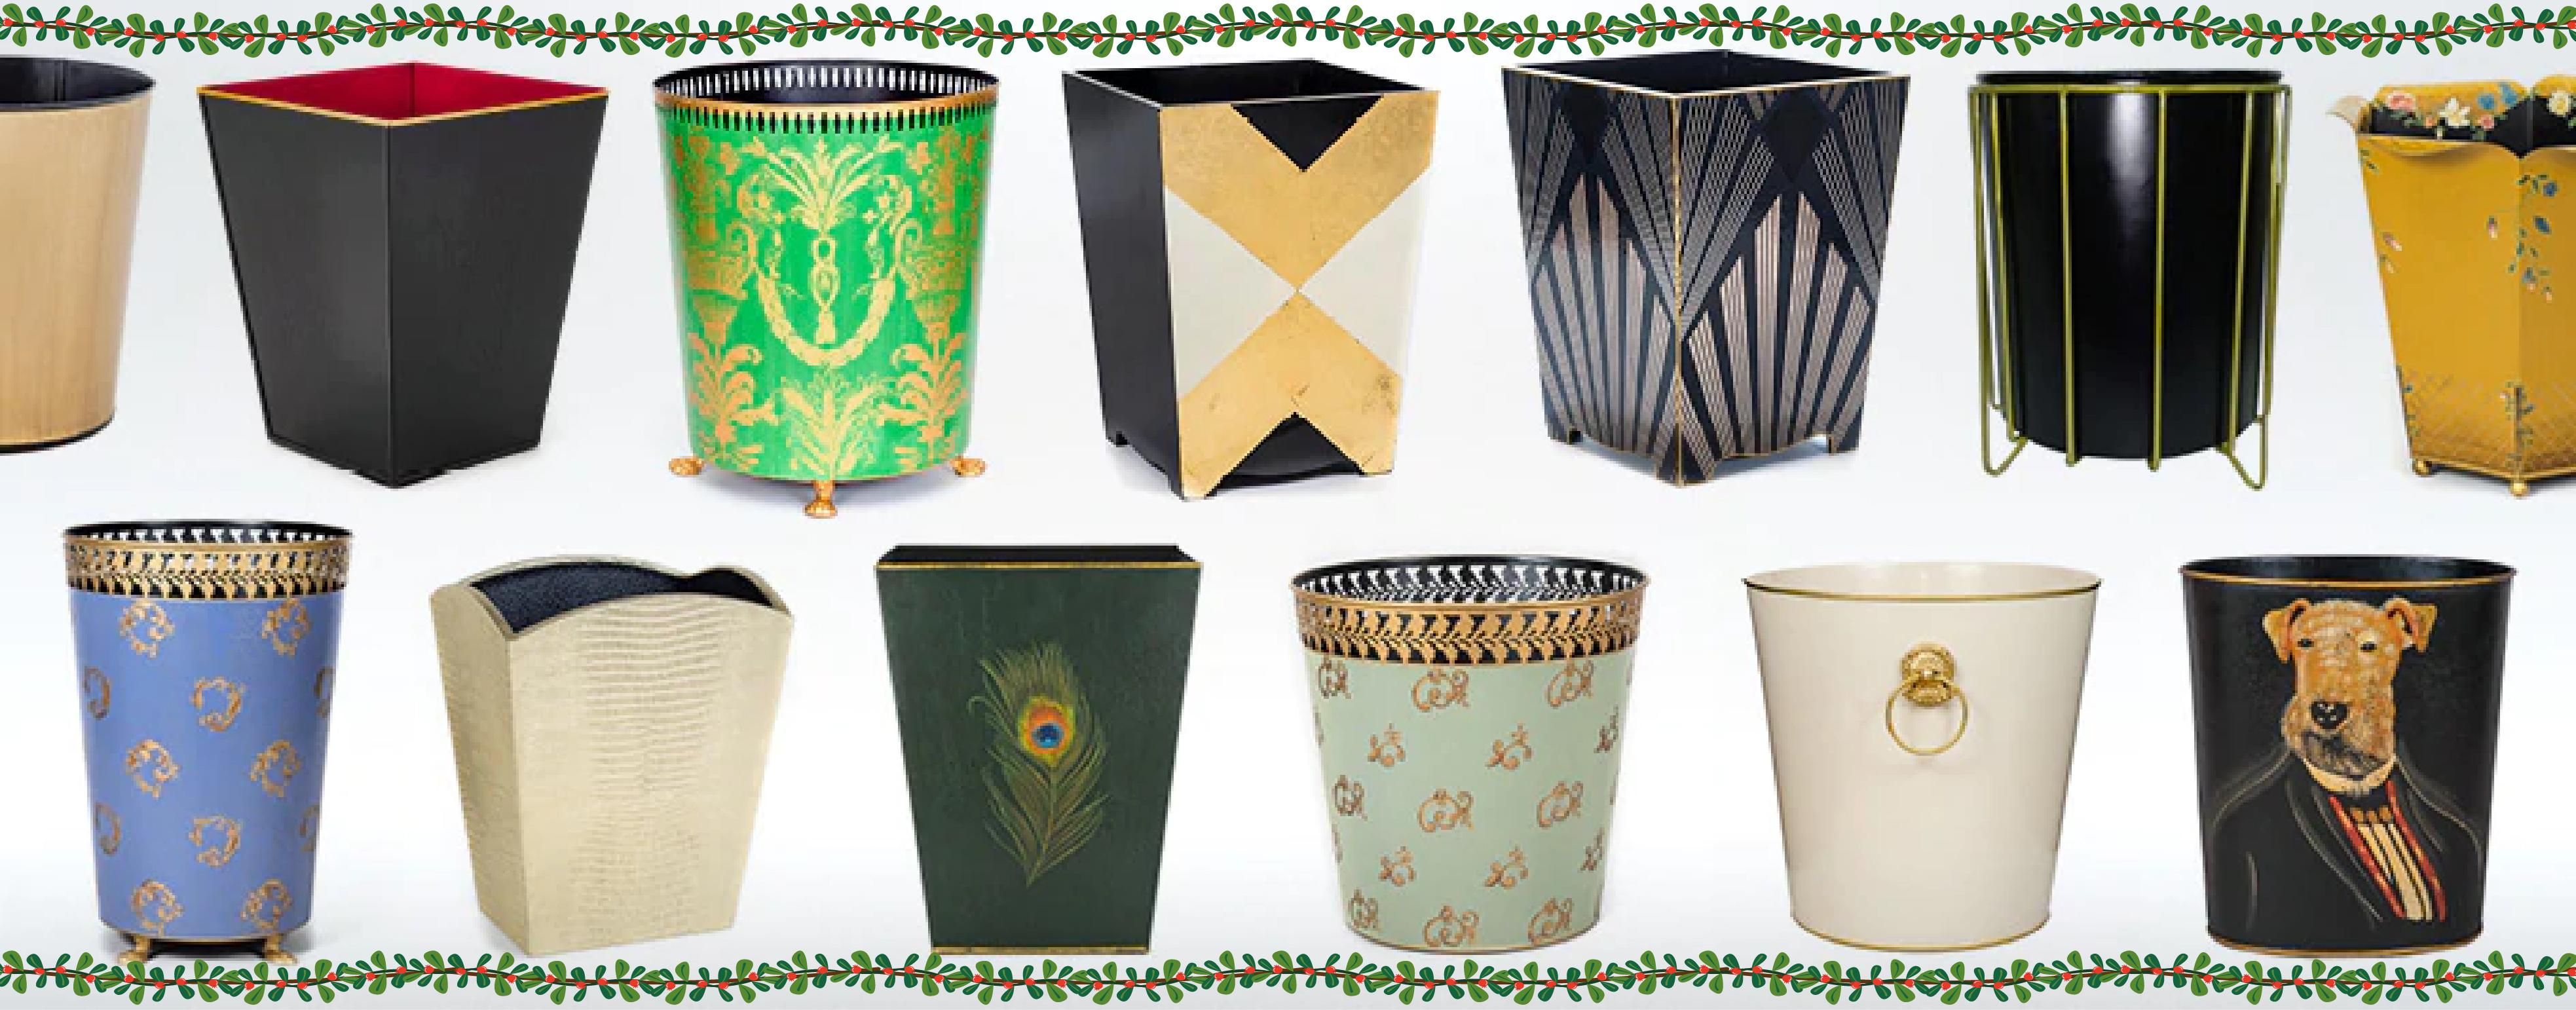 ecorative luxury waste paper bins baskets trash cans metal painted wood  Must Have Bins